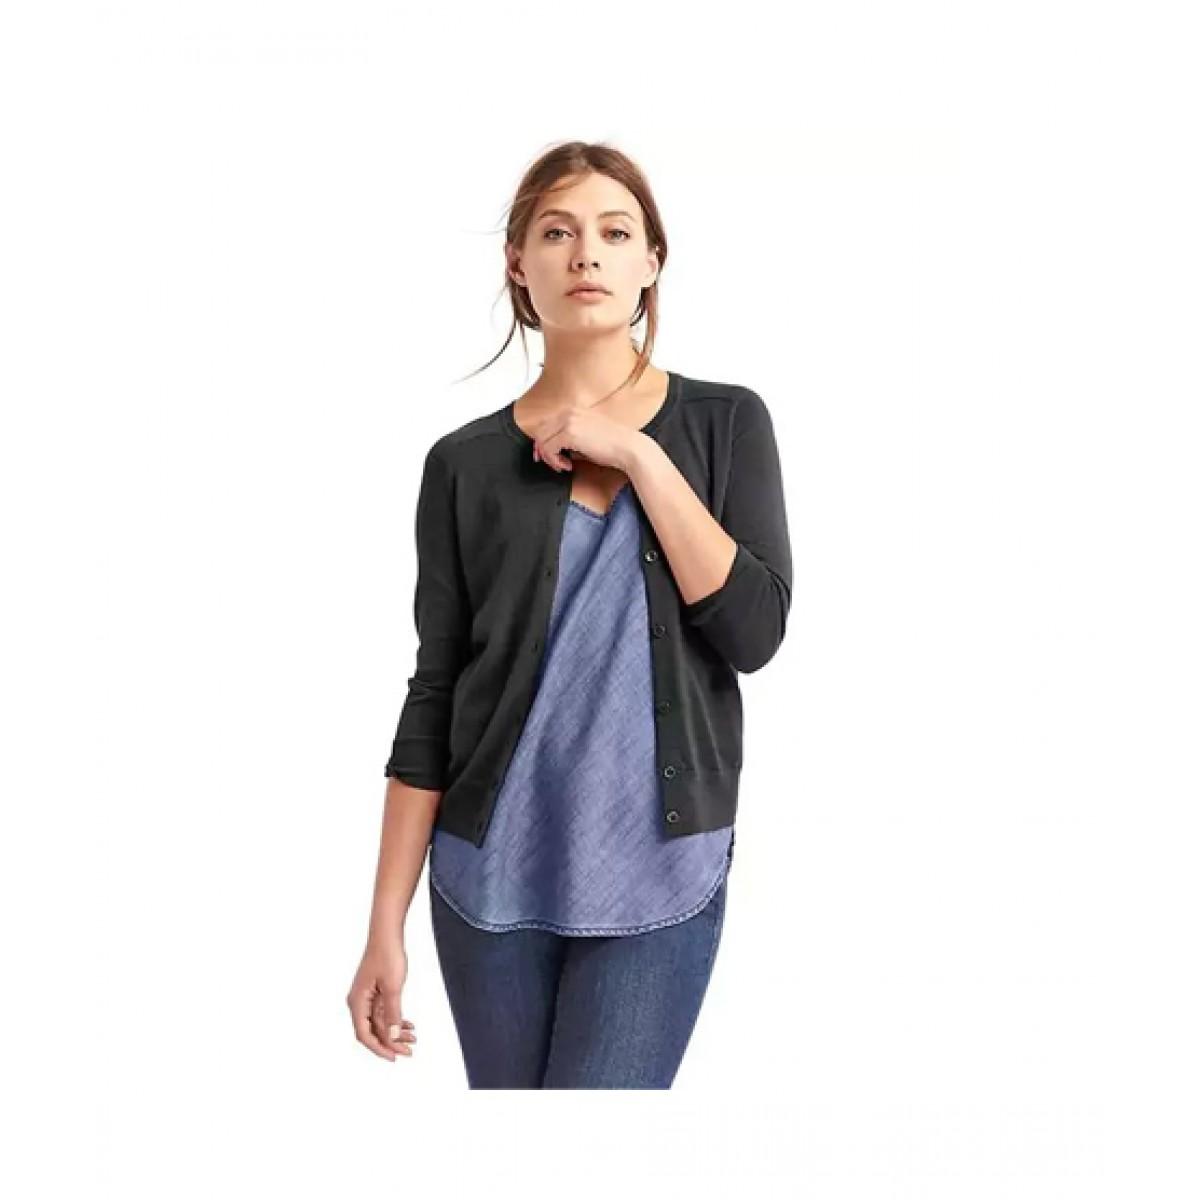 8bef28bd1d3cb1 Gap Wool Crewneck Women's Sweater Price in Pakistan   Buy Gap Merino  Cardigan Sweater True Black   iShopping.pk